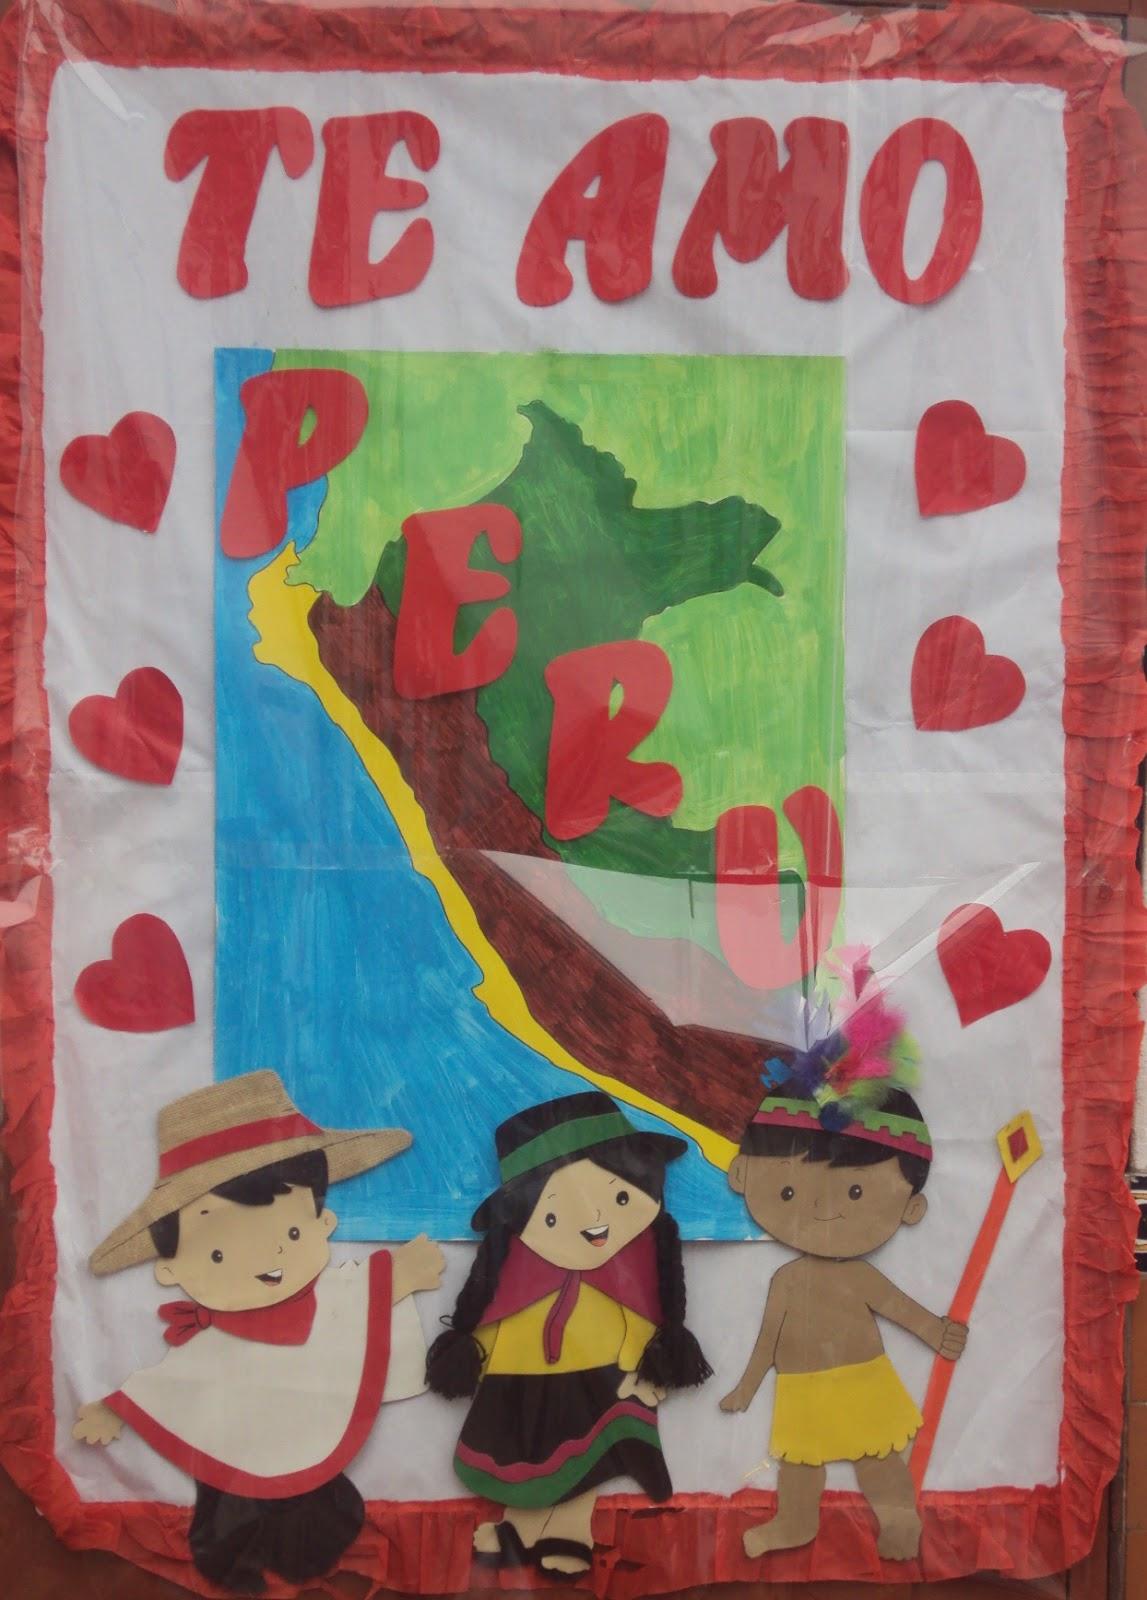 Semana patri tica en la iep blas pascal semana patri tica for Diario mural fiestas patrias chile